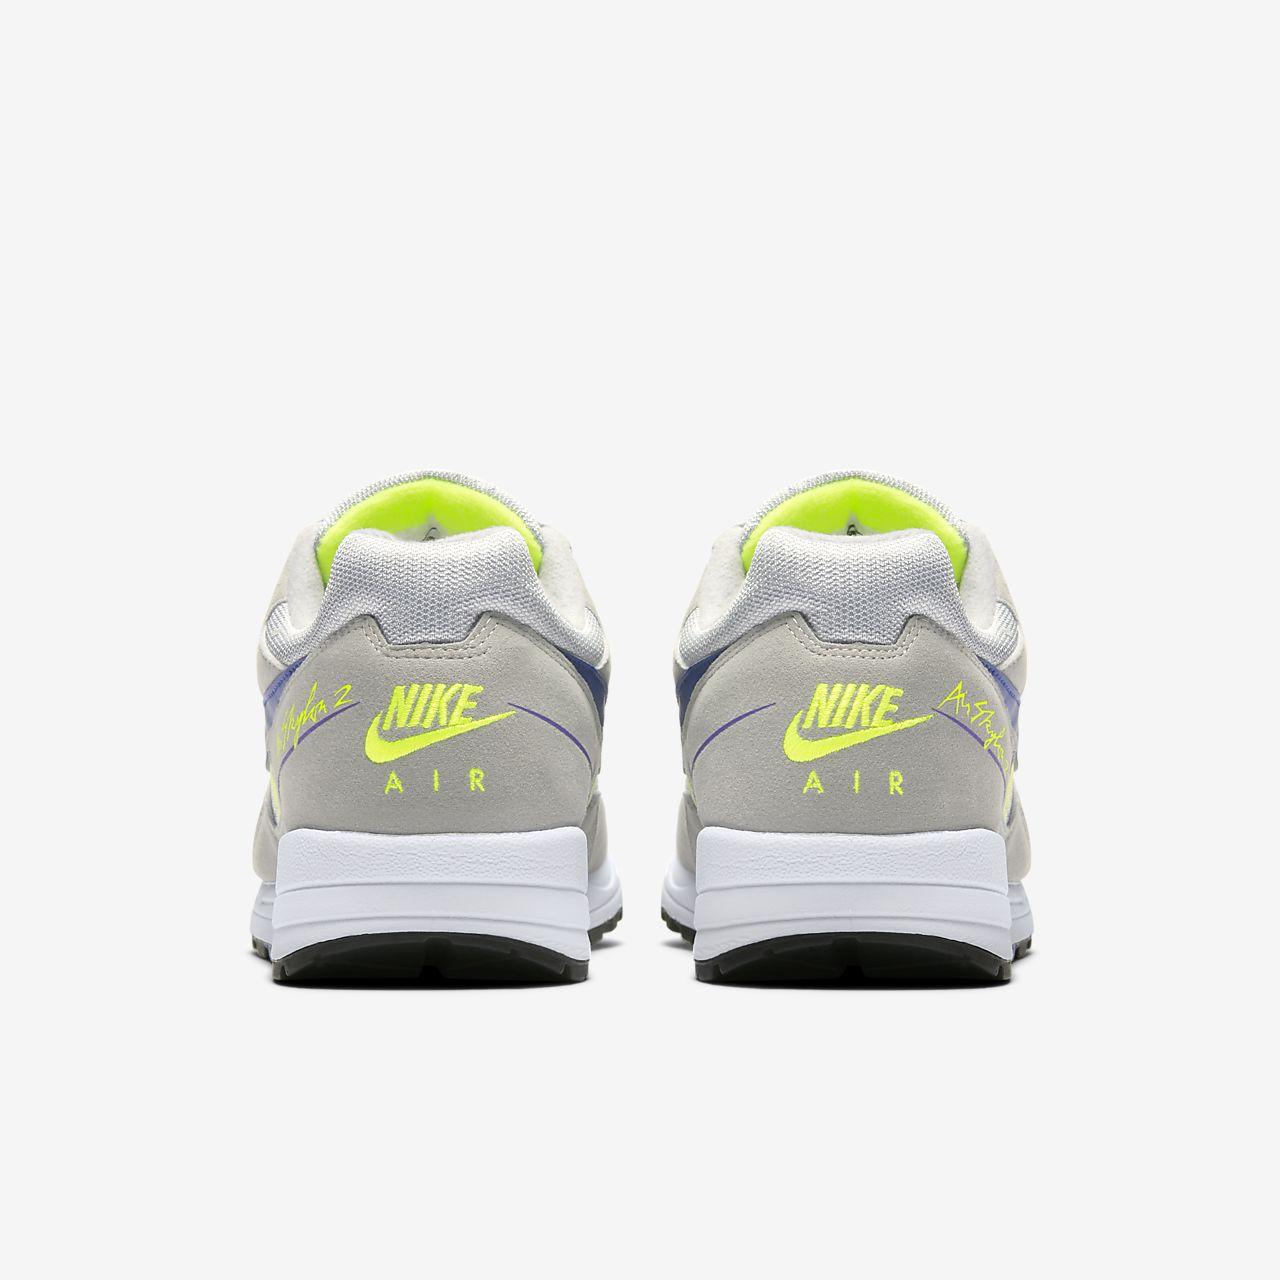 new product 924a4 adc02 ... Nike Air Skylon II Men s Shoe